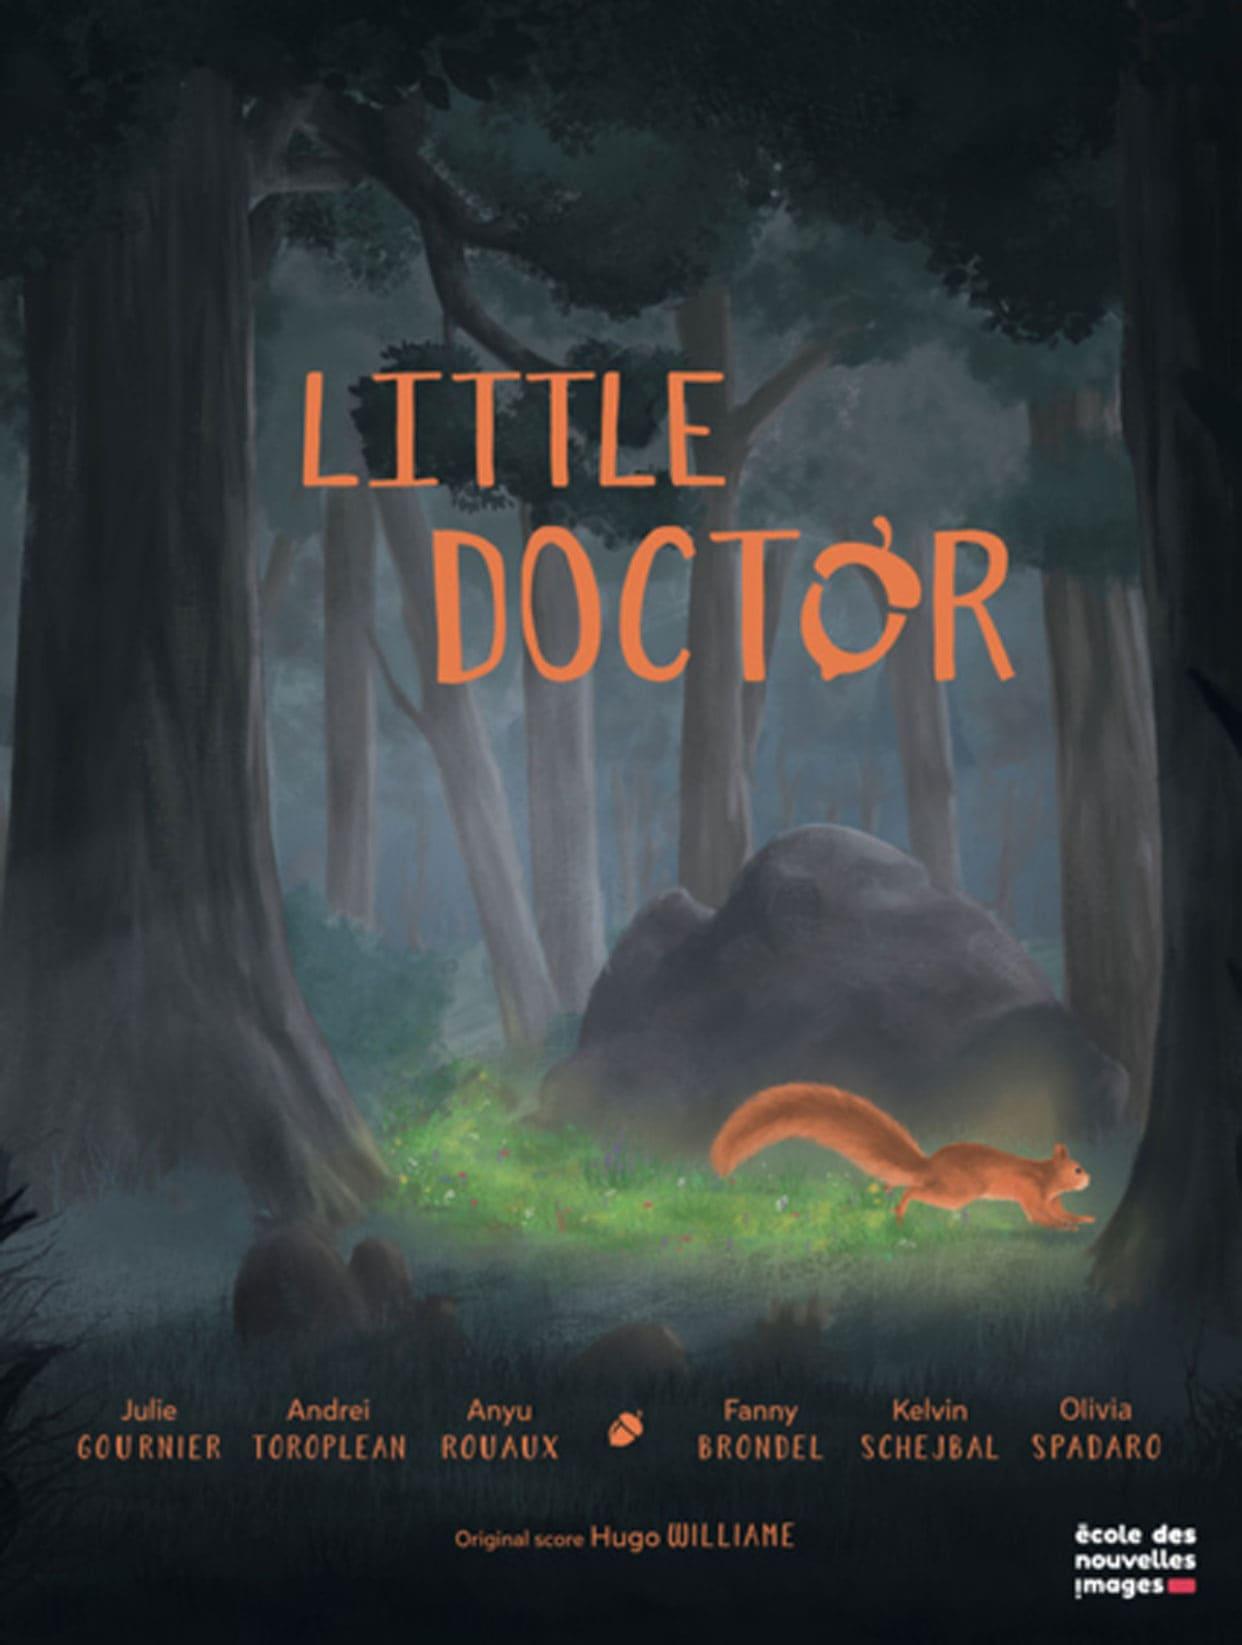 LITTLE-DOCTOR-Fanny-BRONDEL-Calvin-SHEIBAL-Olivia-SPADARO-Yuli-JURNIER-Andrey-TOROPLEAN-Anya-RUAUH